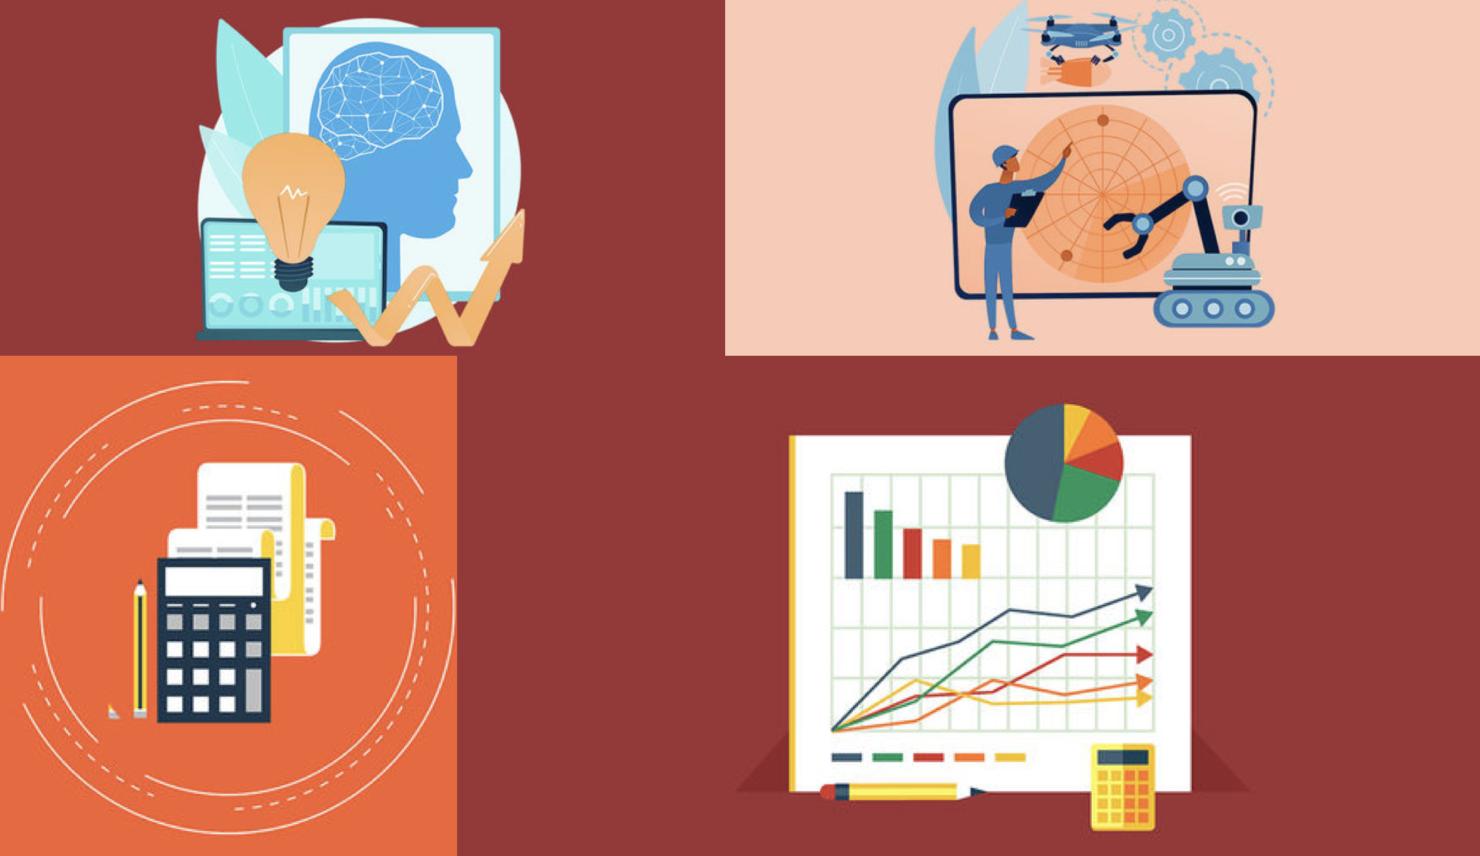 Mathematics Training tutor app